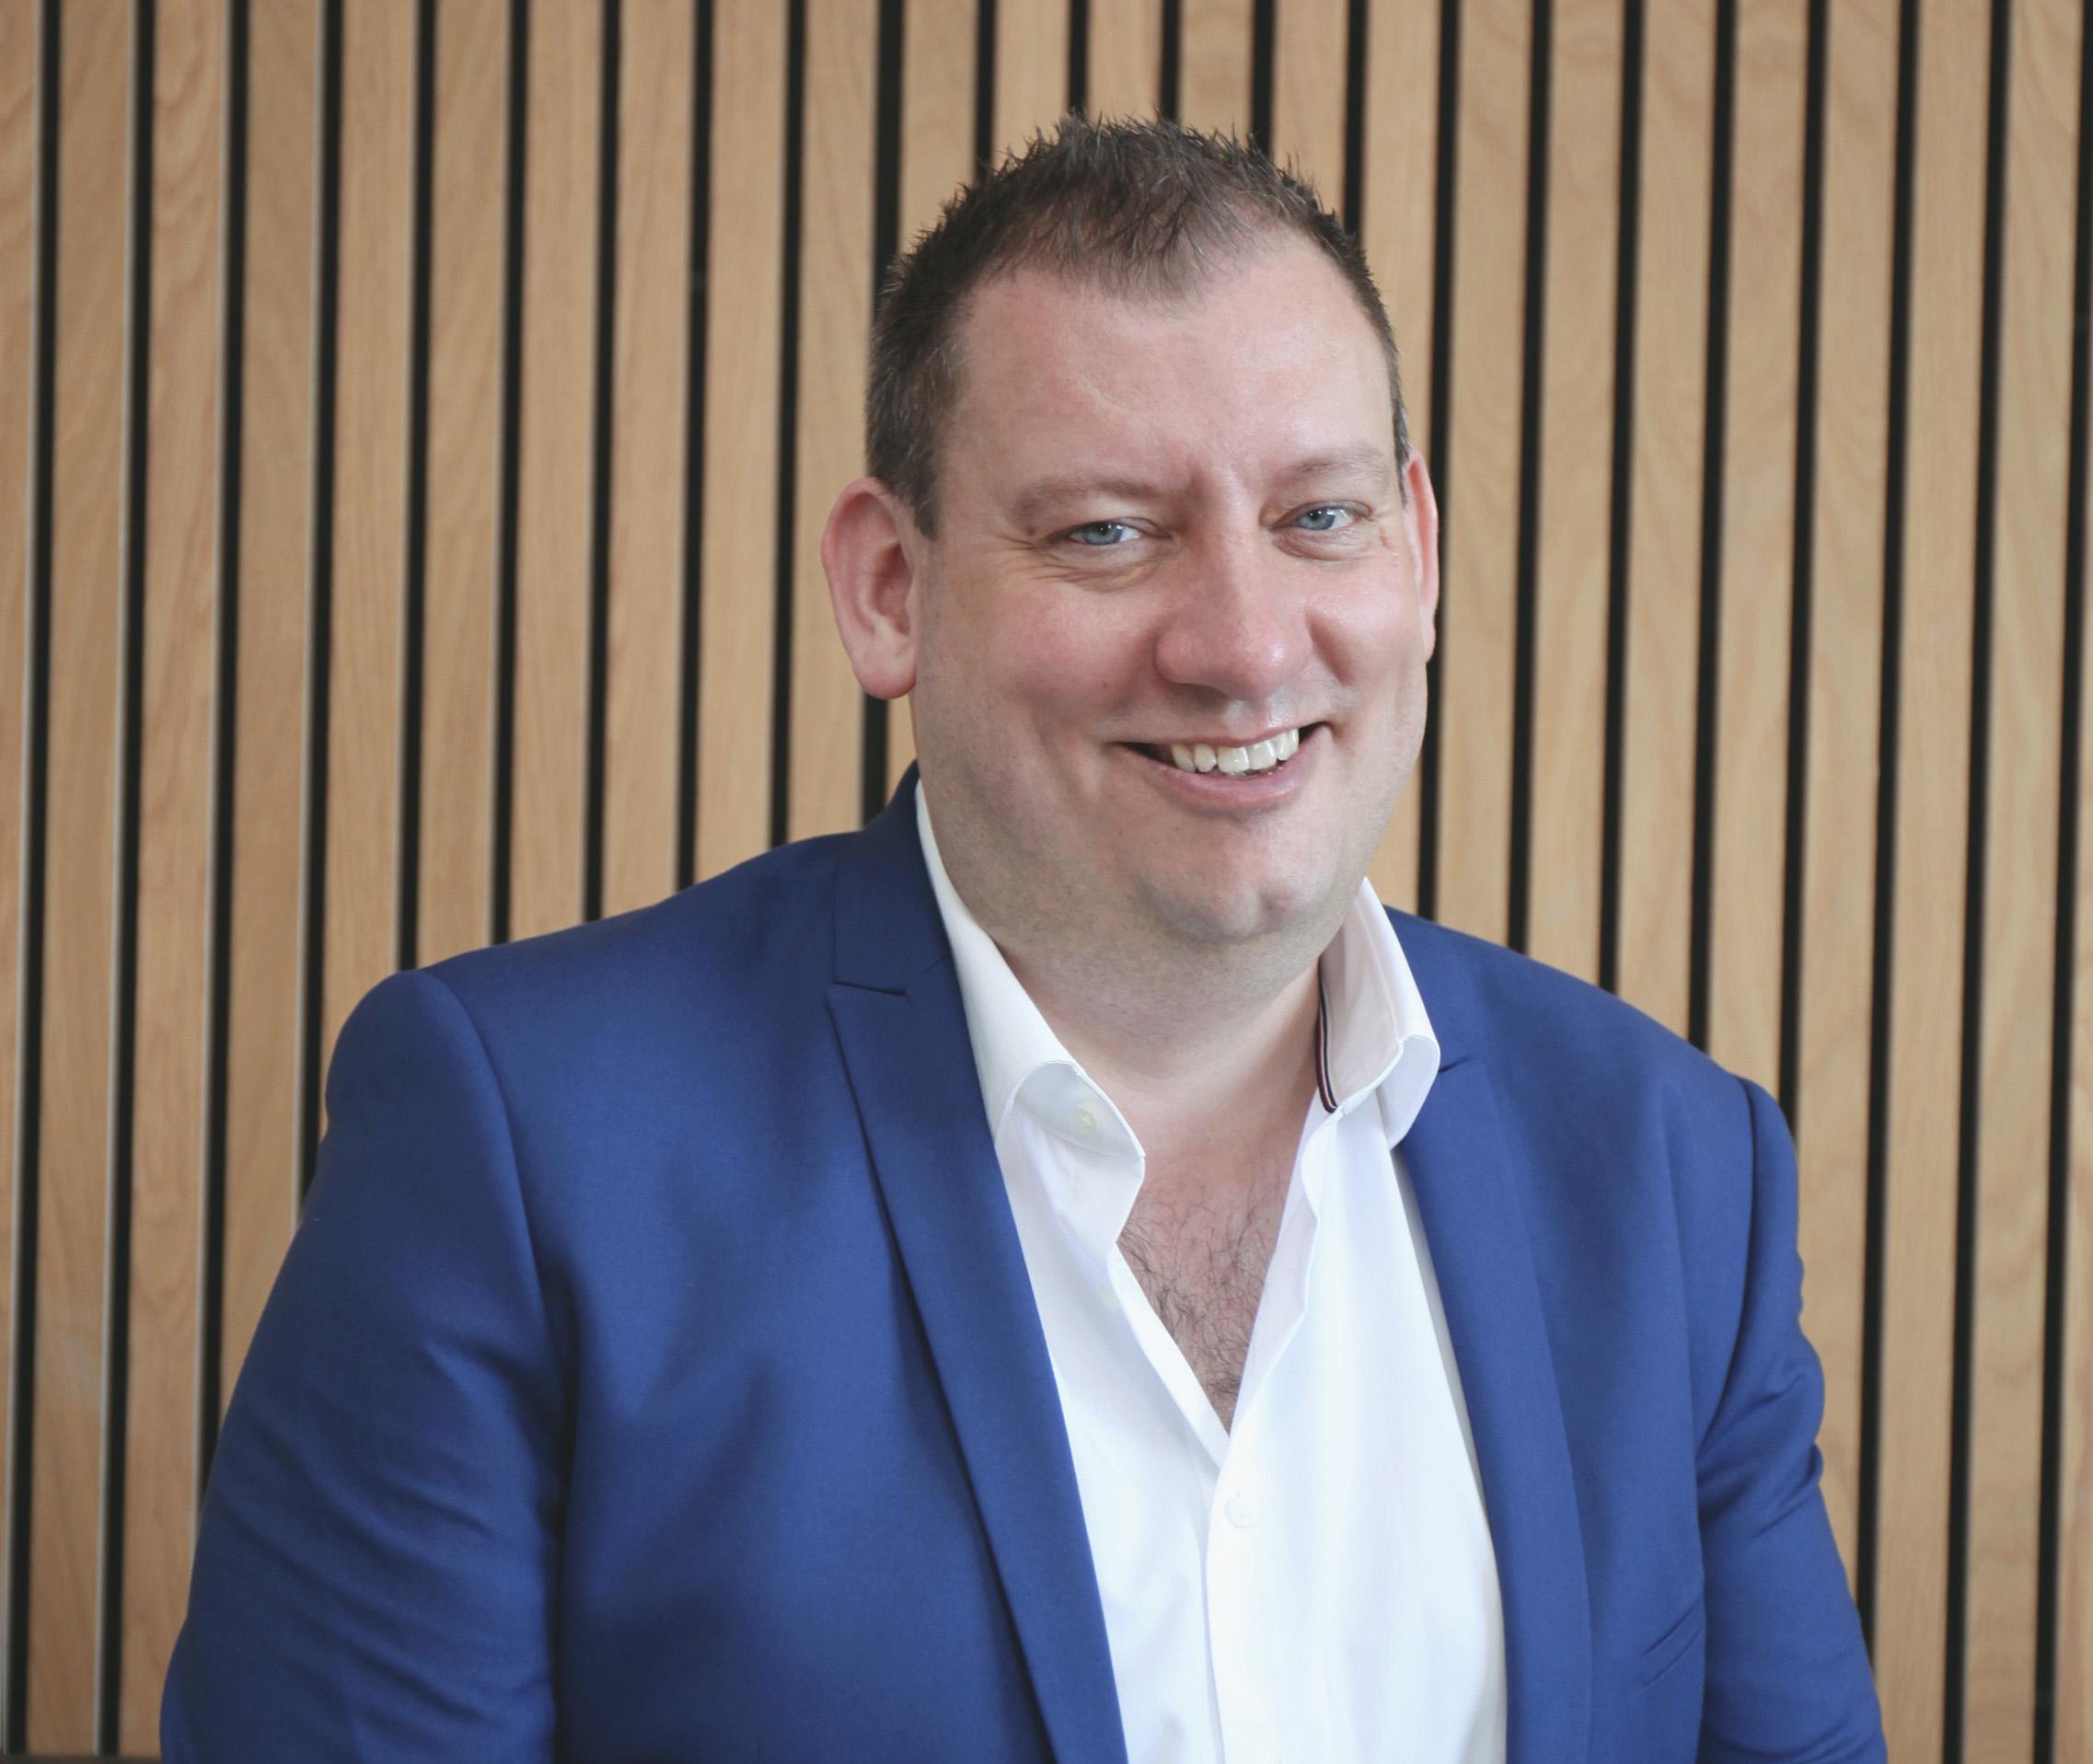 Astrocytia CEO Brian Thomsen